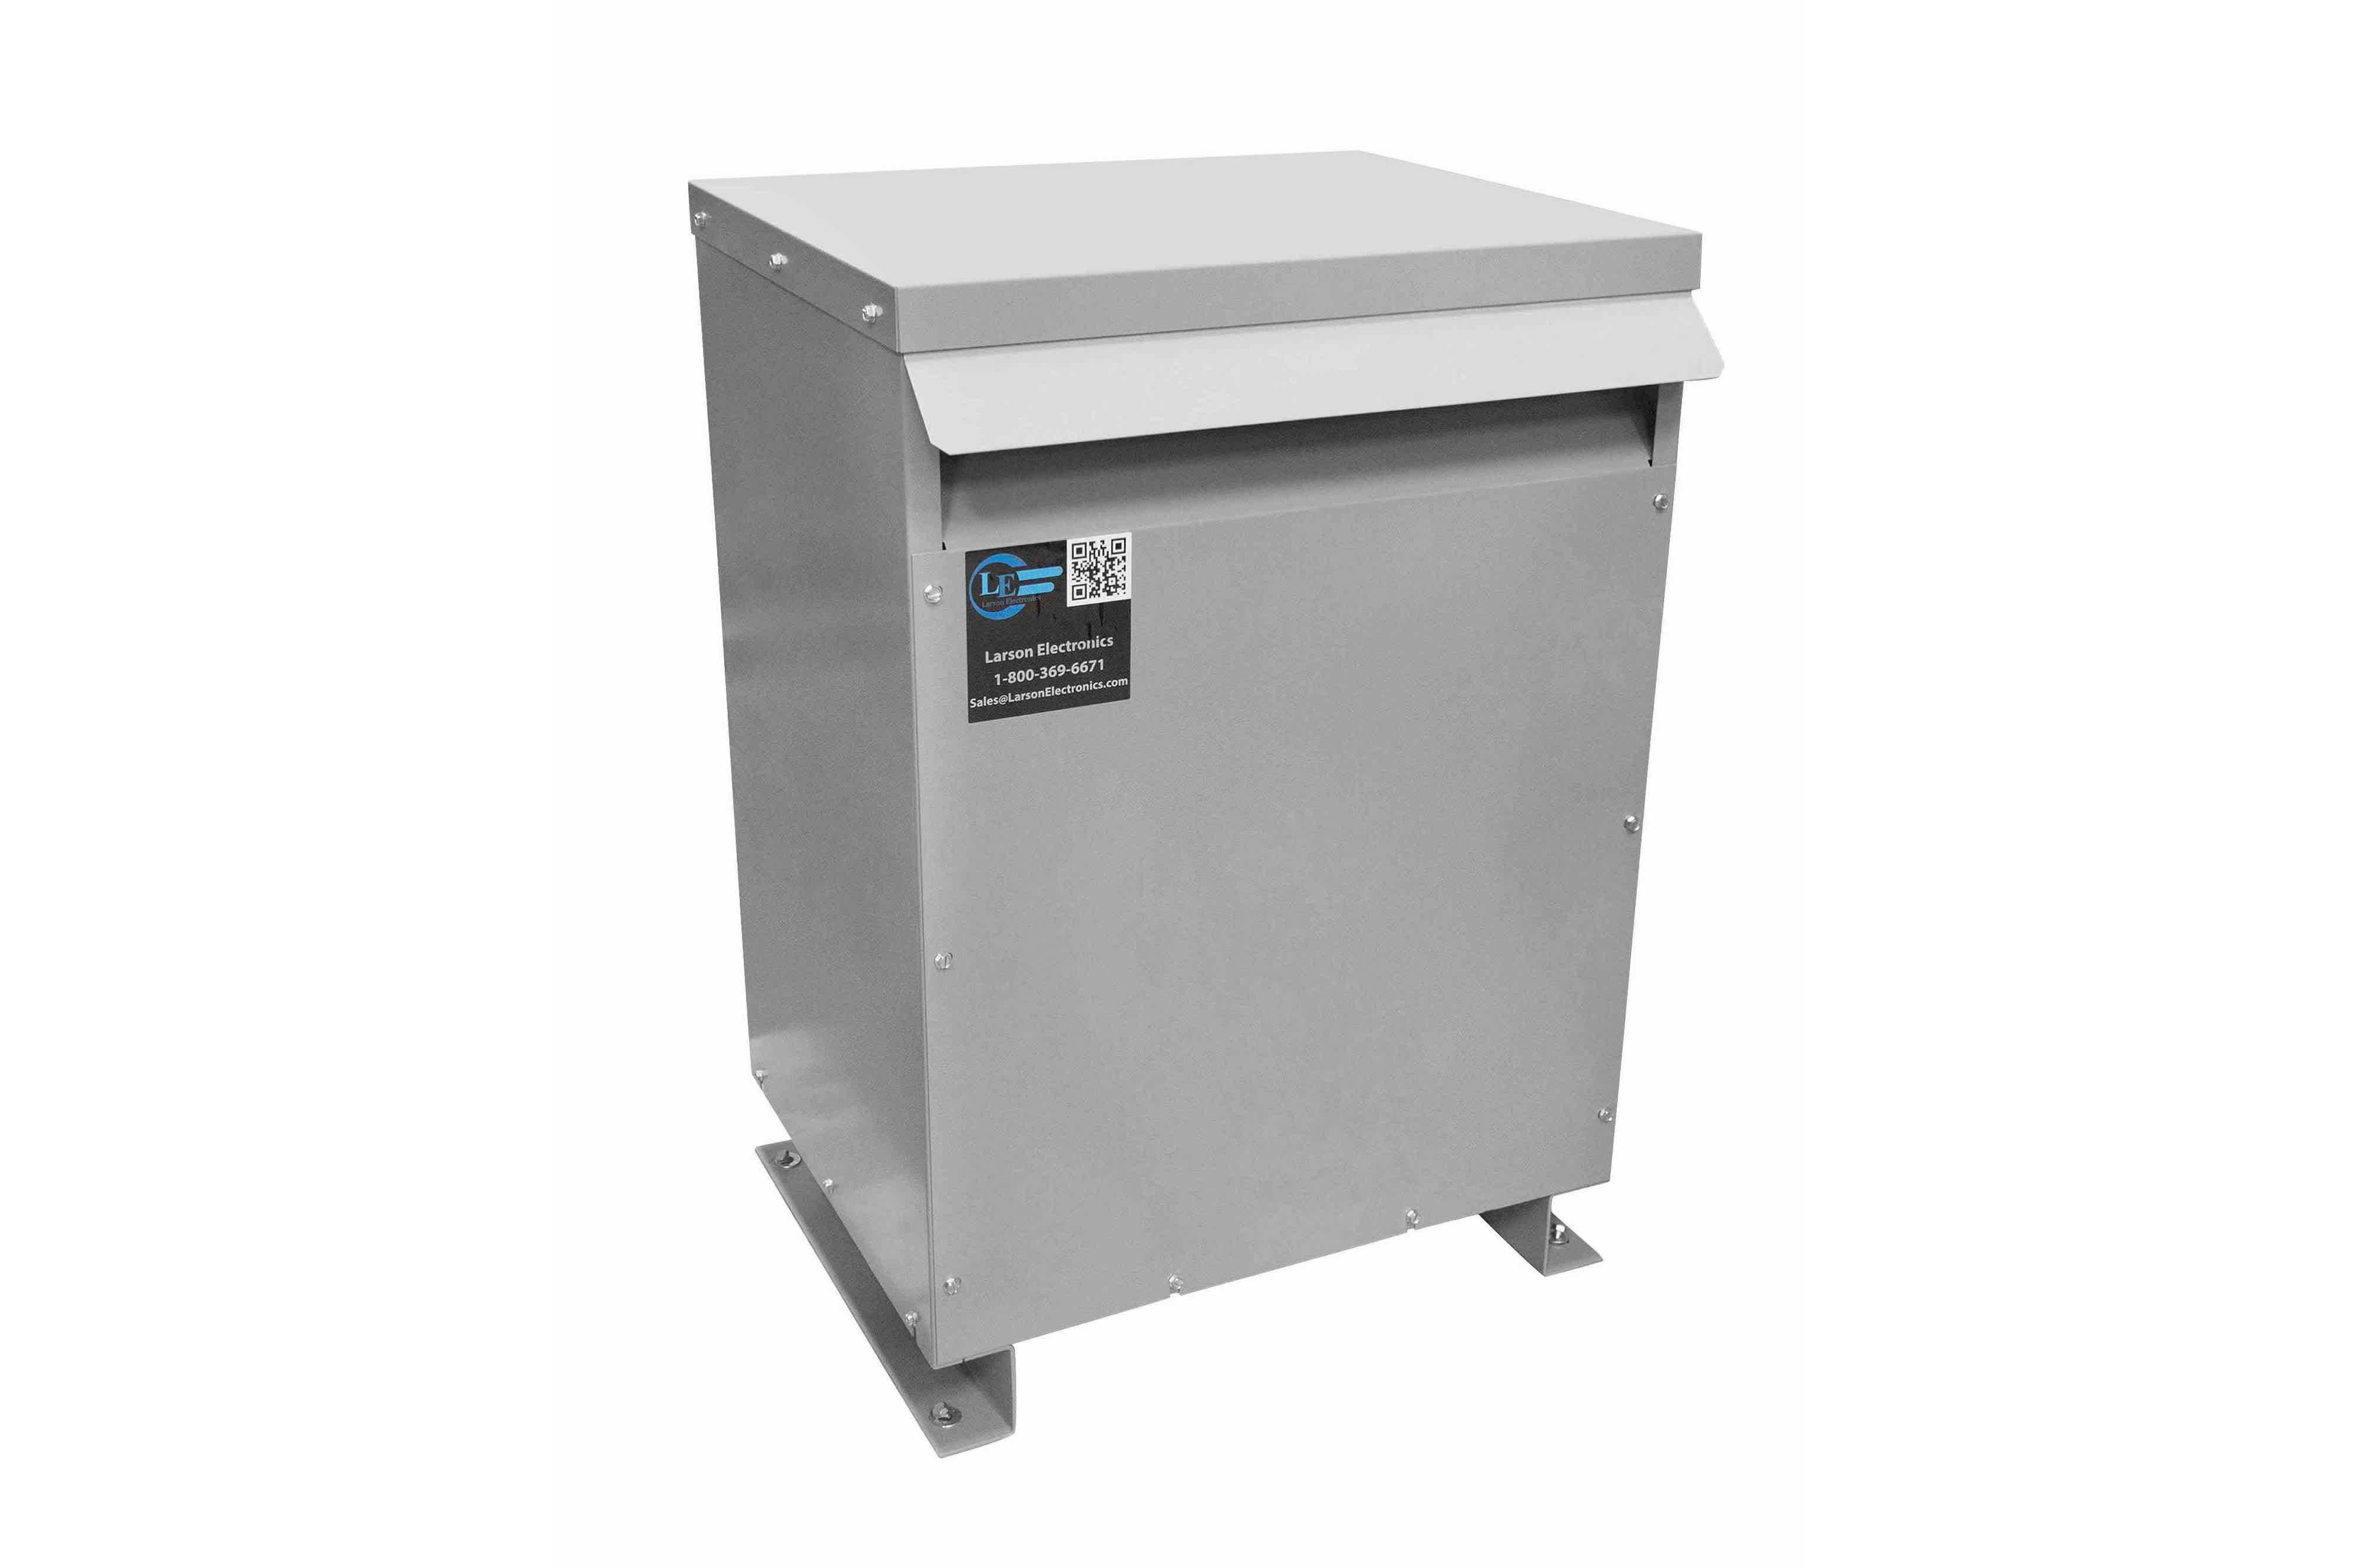 750 kVA 3PH Isolation Transformer, 575V Wye Primary, 415V Delta Secondary, N3R, Ventilated, 60 Hz